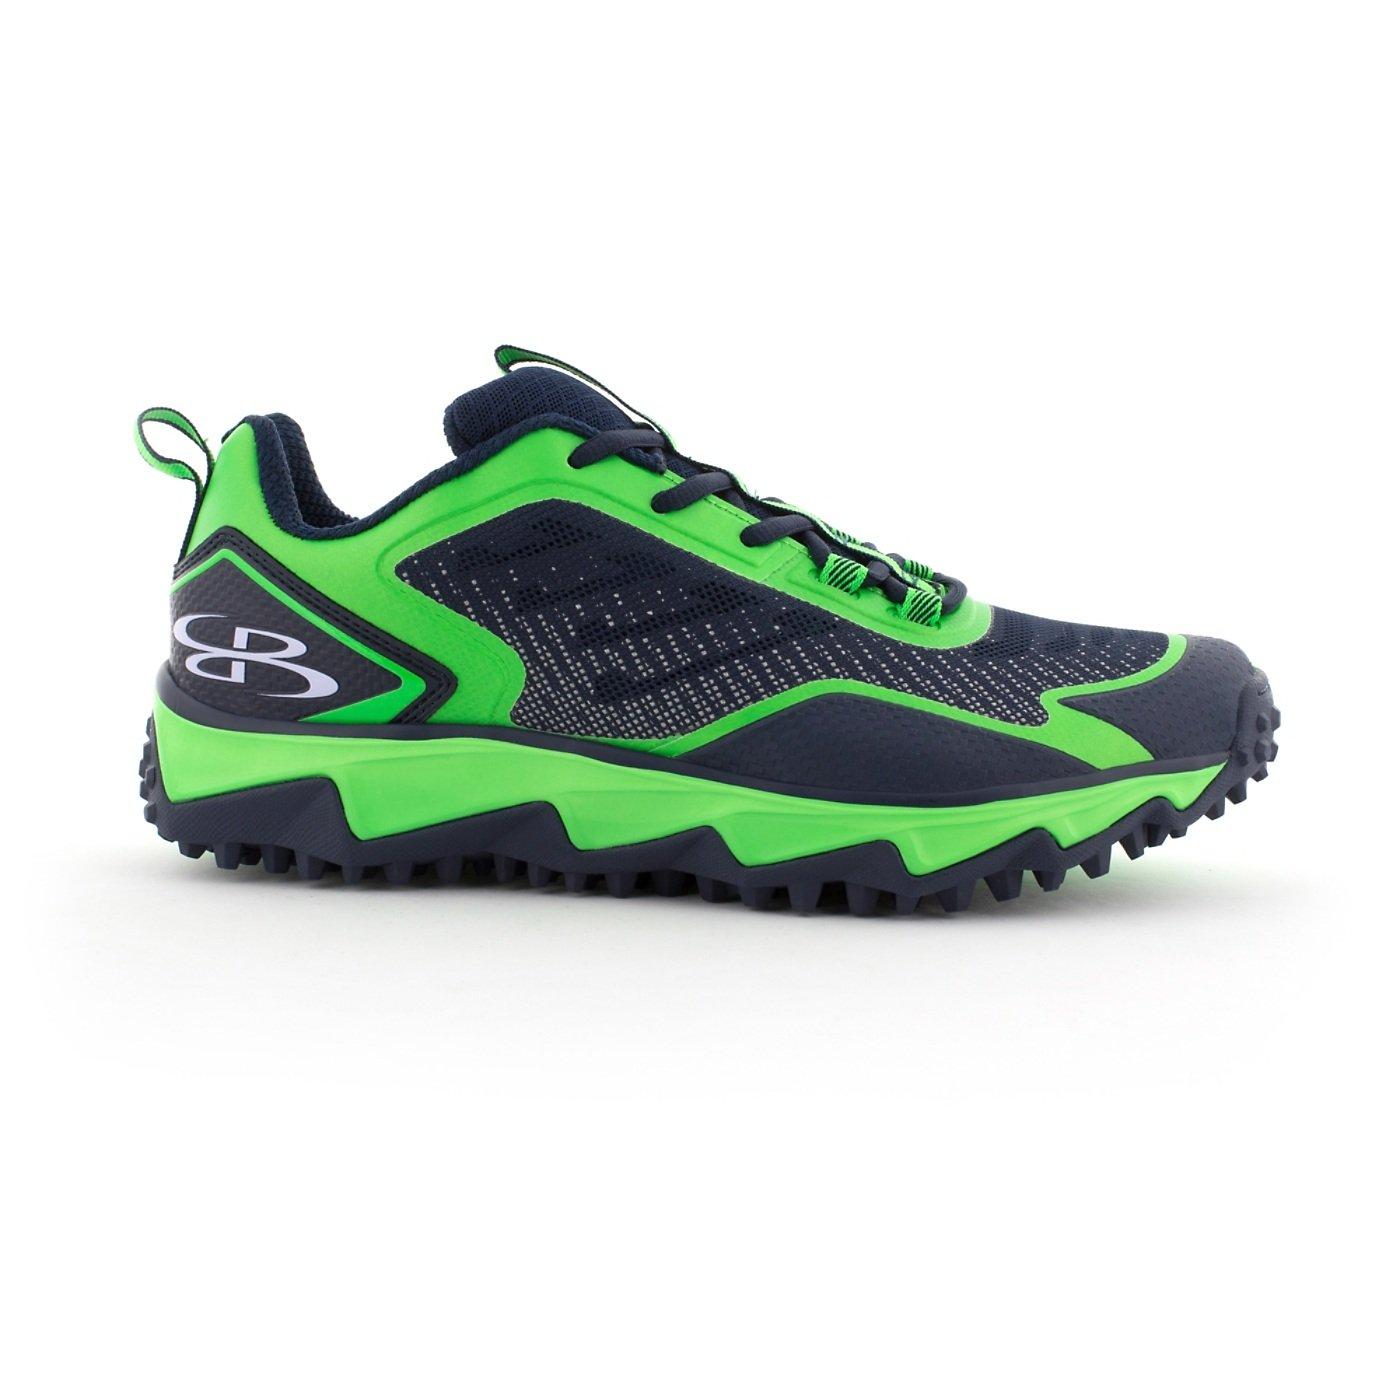 BoombahメンズBerzerk Turf Shoes – 13色オプション – 複数のサイズ B076B2HCVS 7.5 Navy/Lime Green Navy/Lime Green 7.5